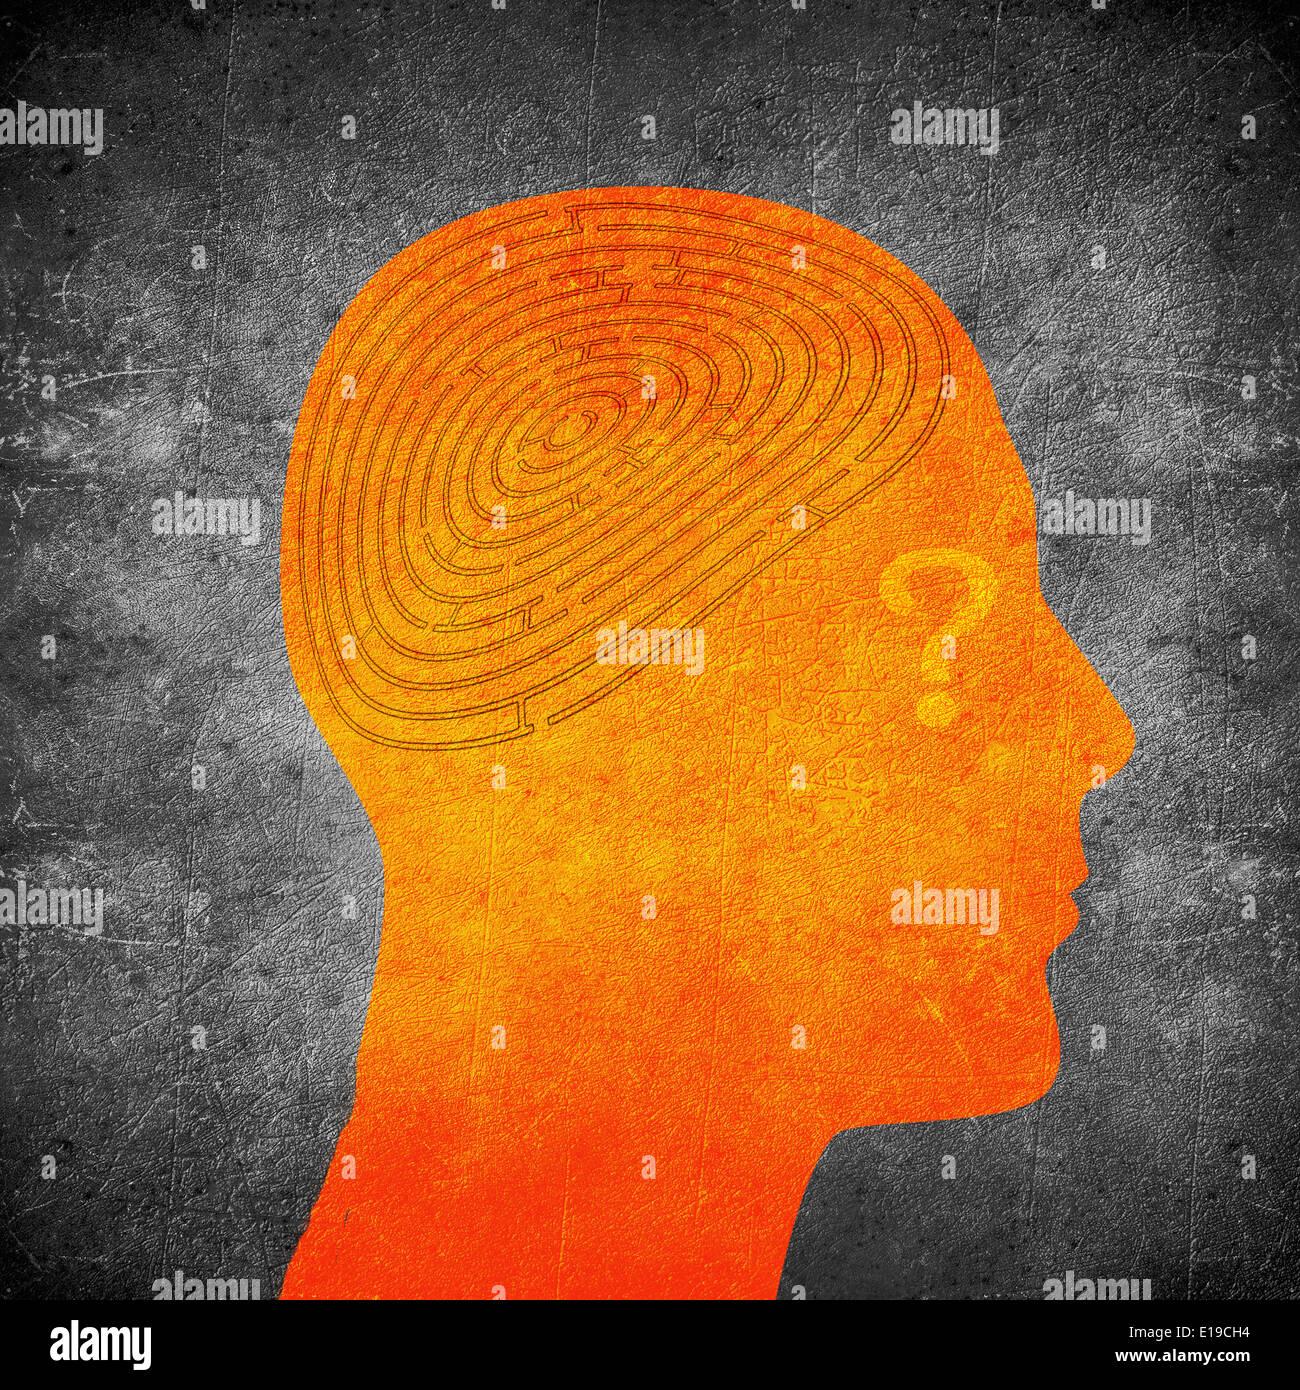 Naranja con cabeza humana laberinto cerebro Imagen De Stock